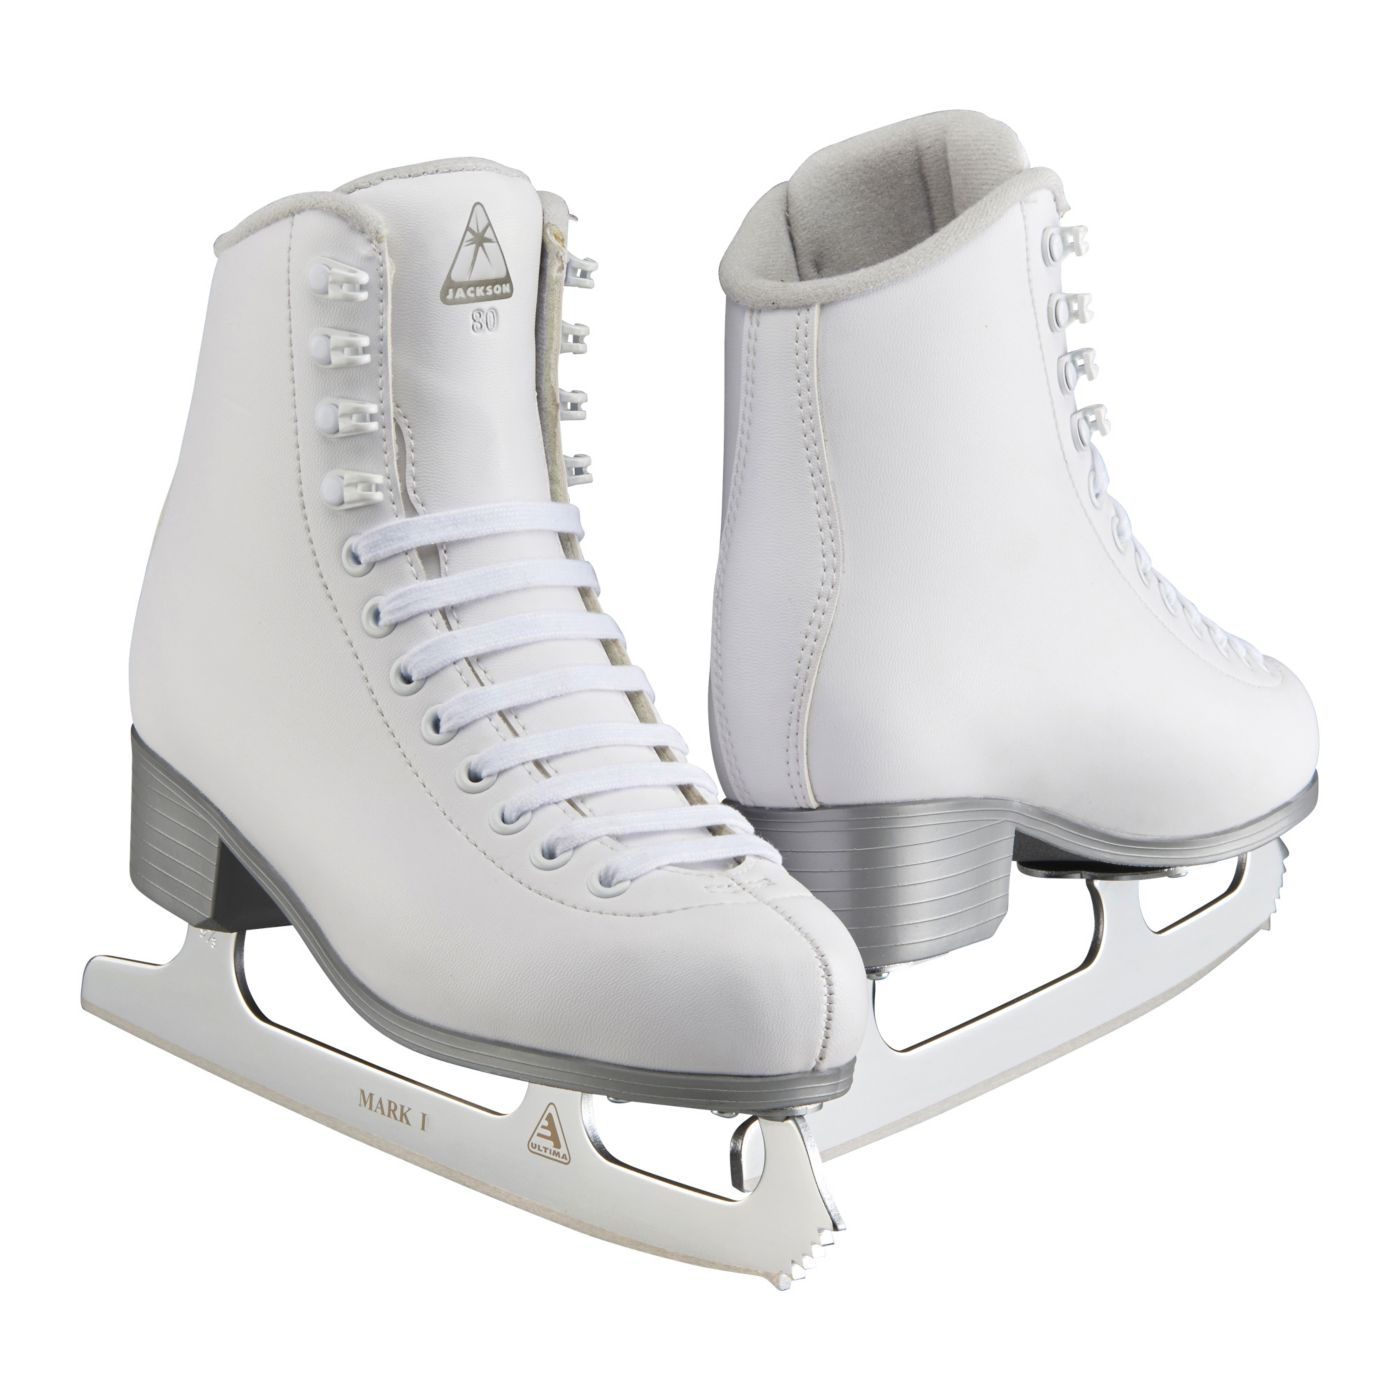 Jackson Ultima Girls Cameo 81 Ice Skates